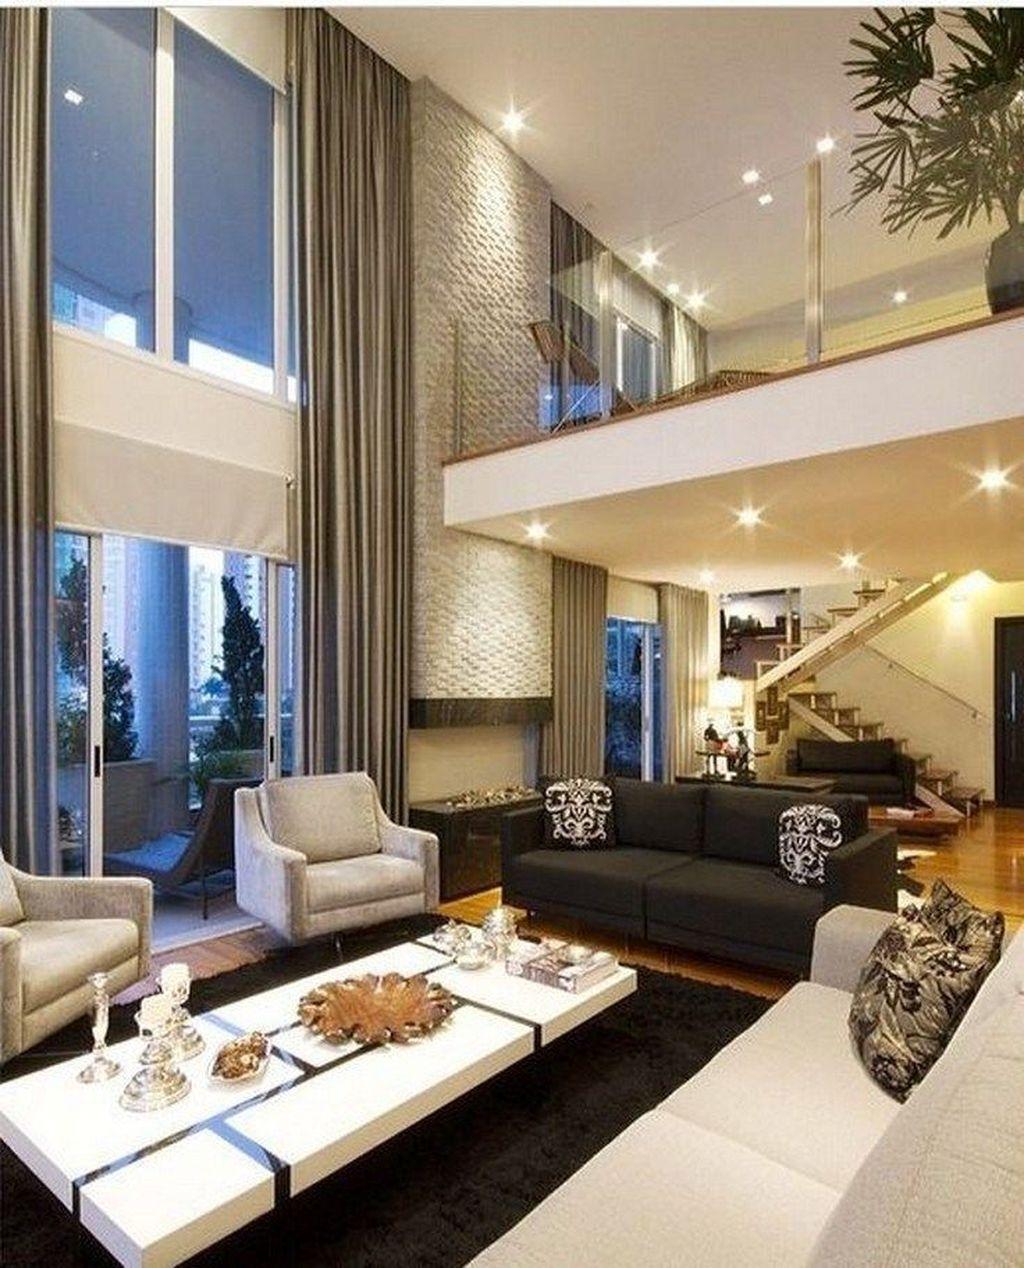 Admirable Modern Interior Design Ideas You Never Seen Before 28